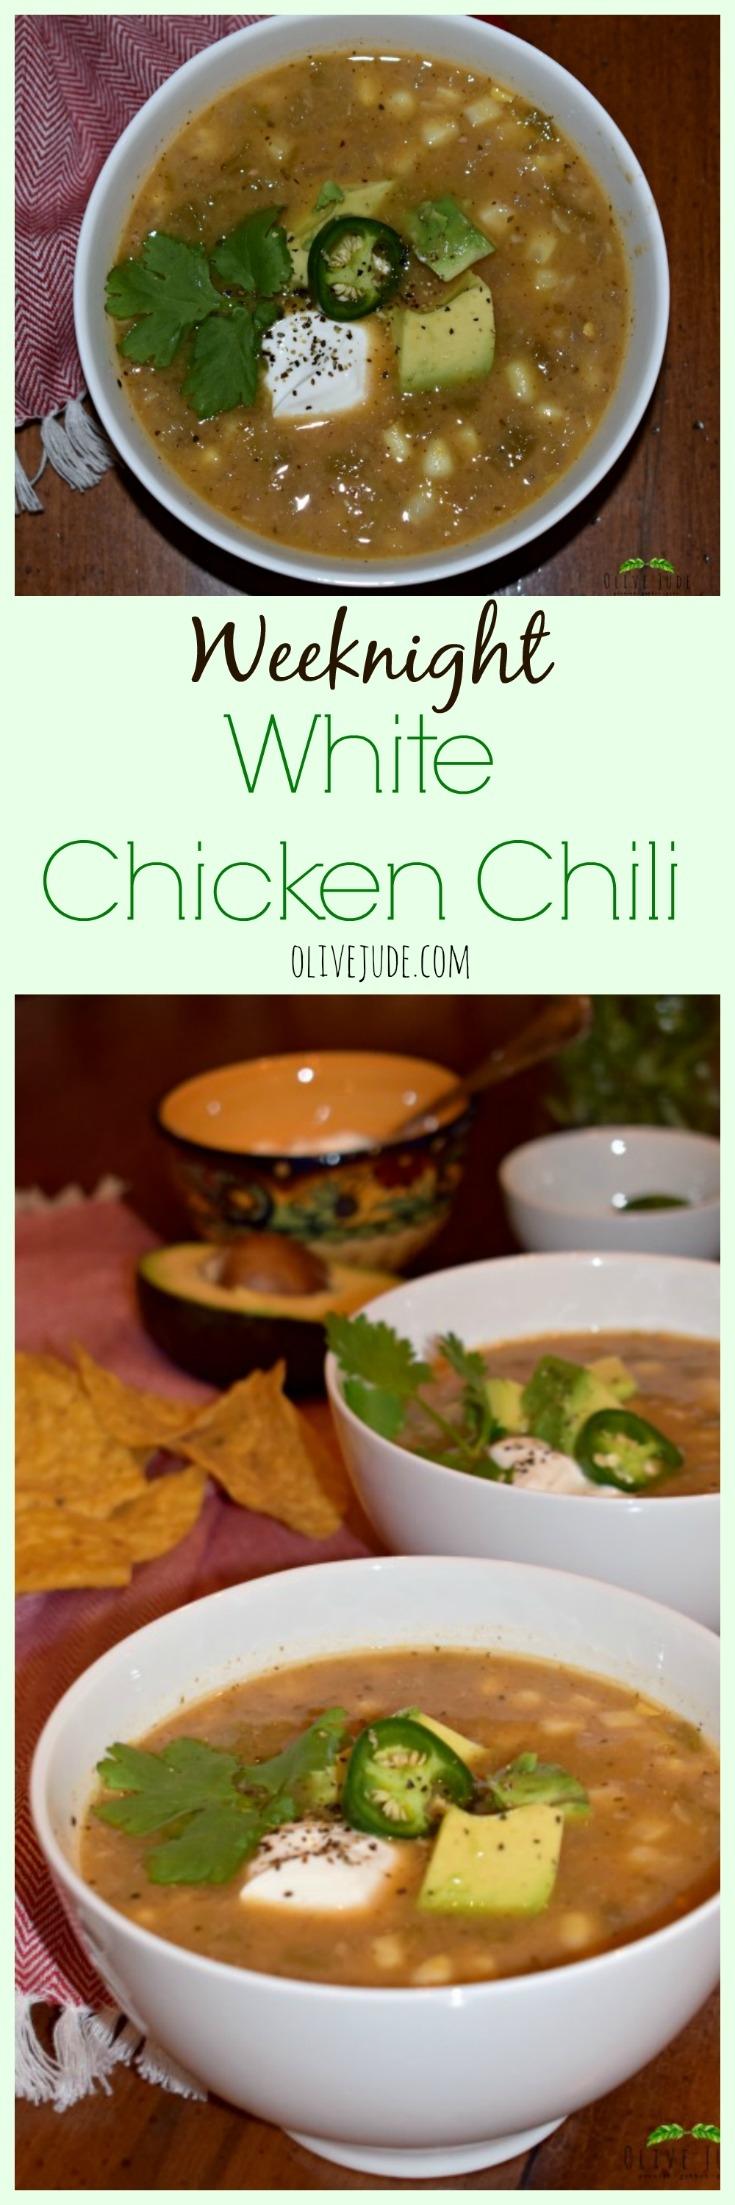 Weeknight White Chicken Chili #whitechili #weeknightsoup #easychilirecipe #chickenchili